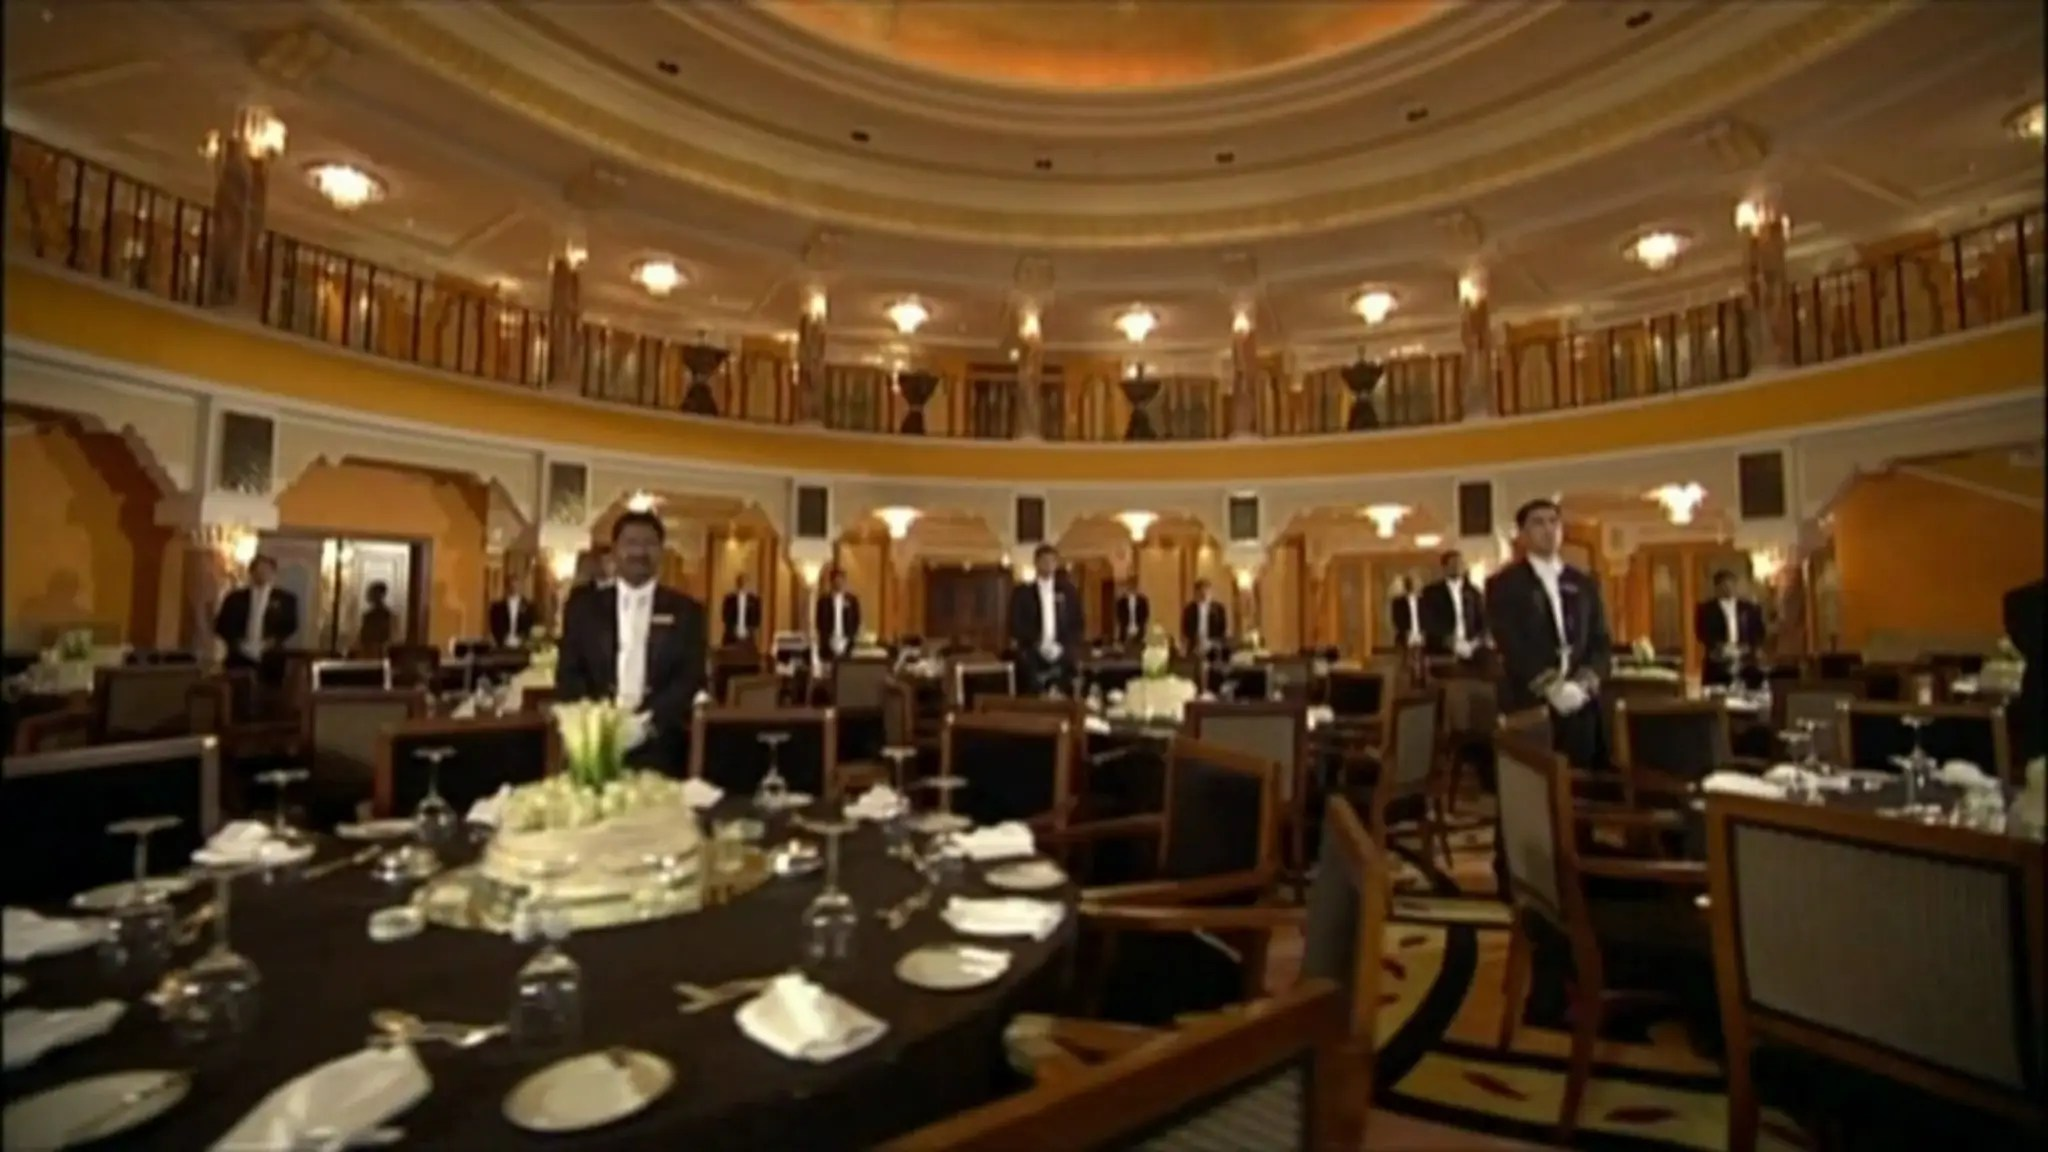 A Tour Of The Burj AlArab  Business Insider